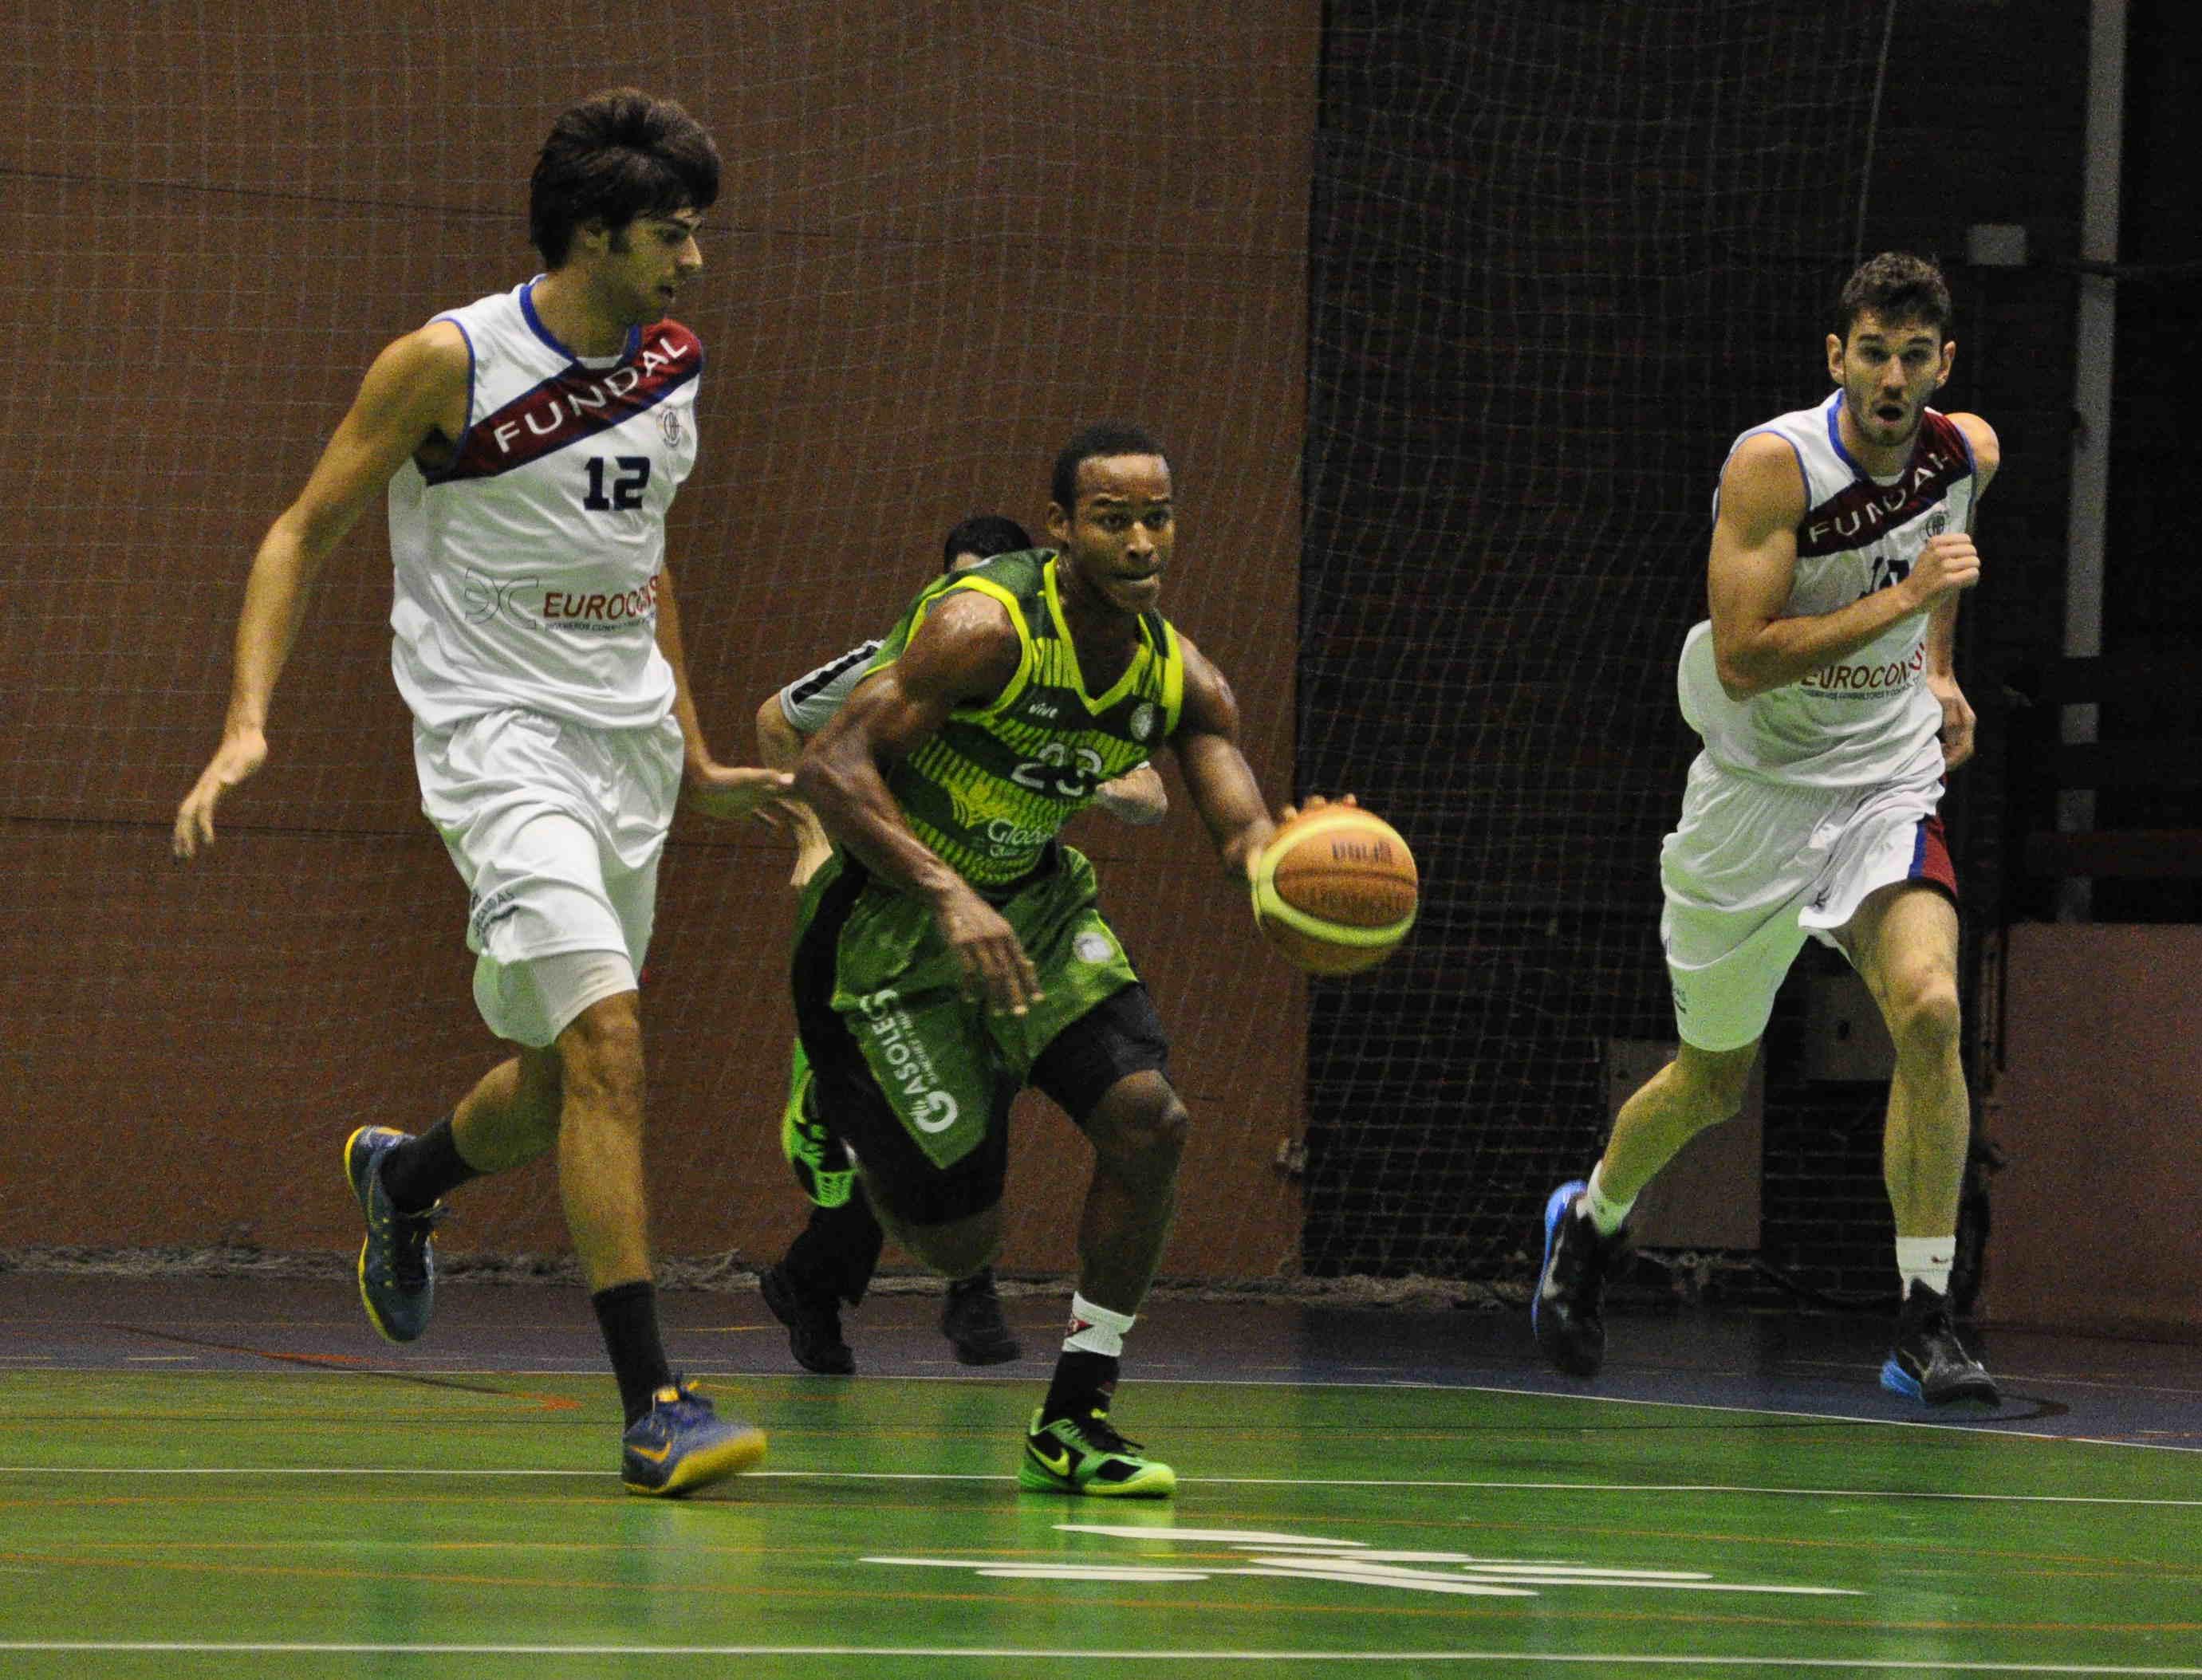 Albacete Basket - Euroconsult Alcobendas 2015-2016